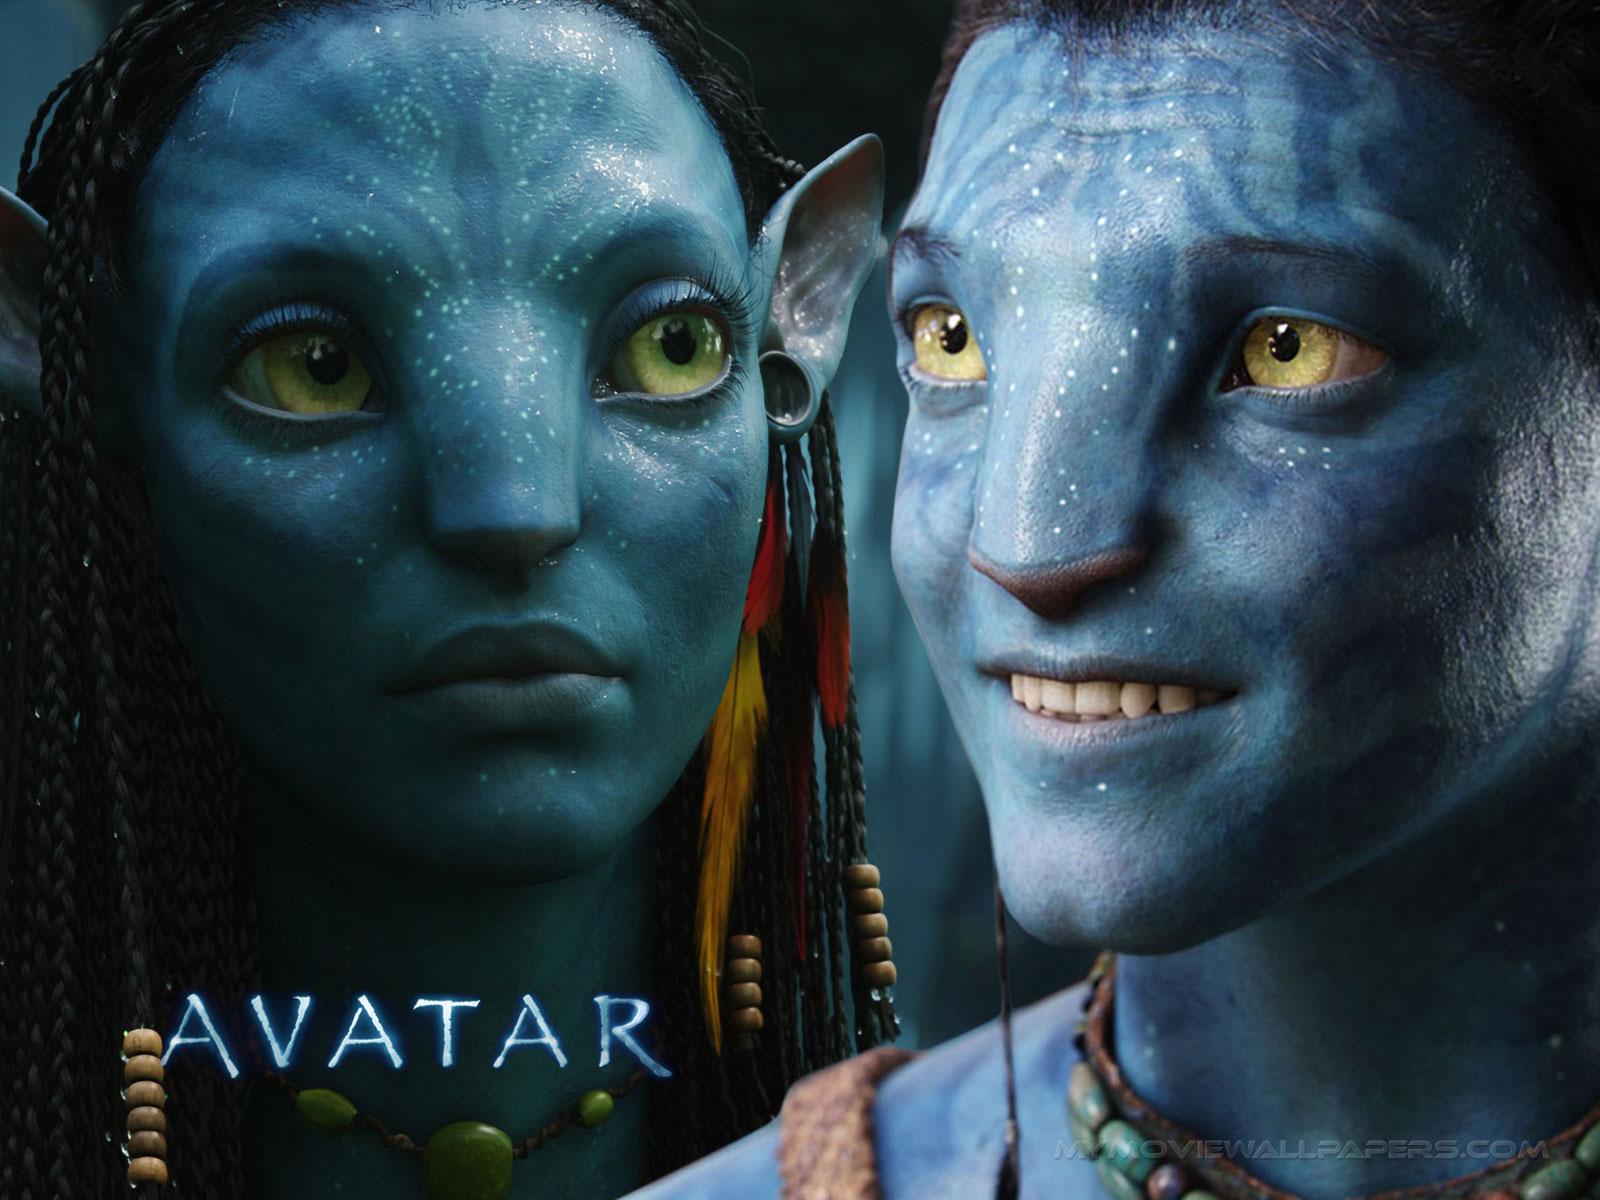 total gross for avatar movie